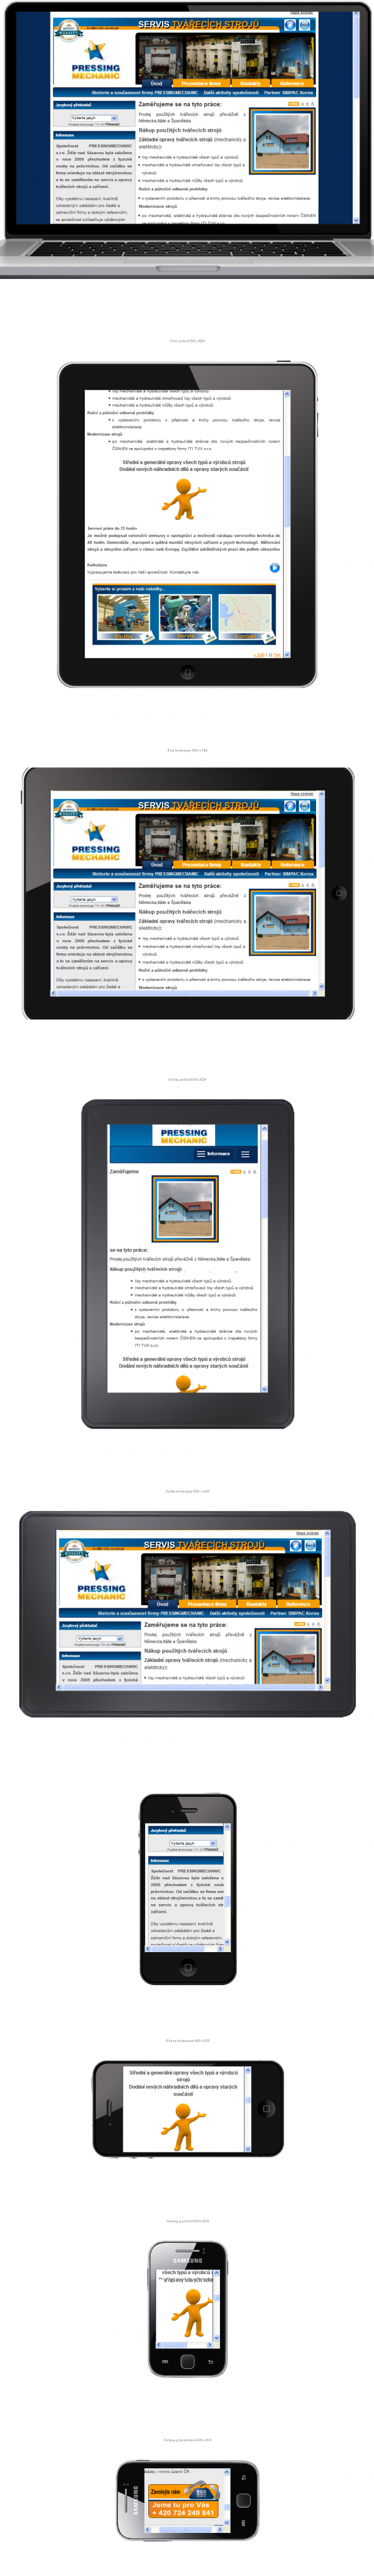 pressingmechanic.cz deviceponsive